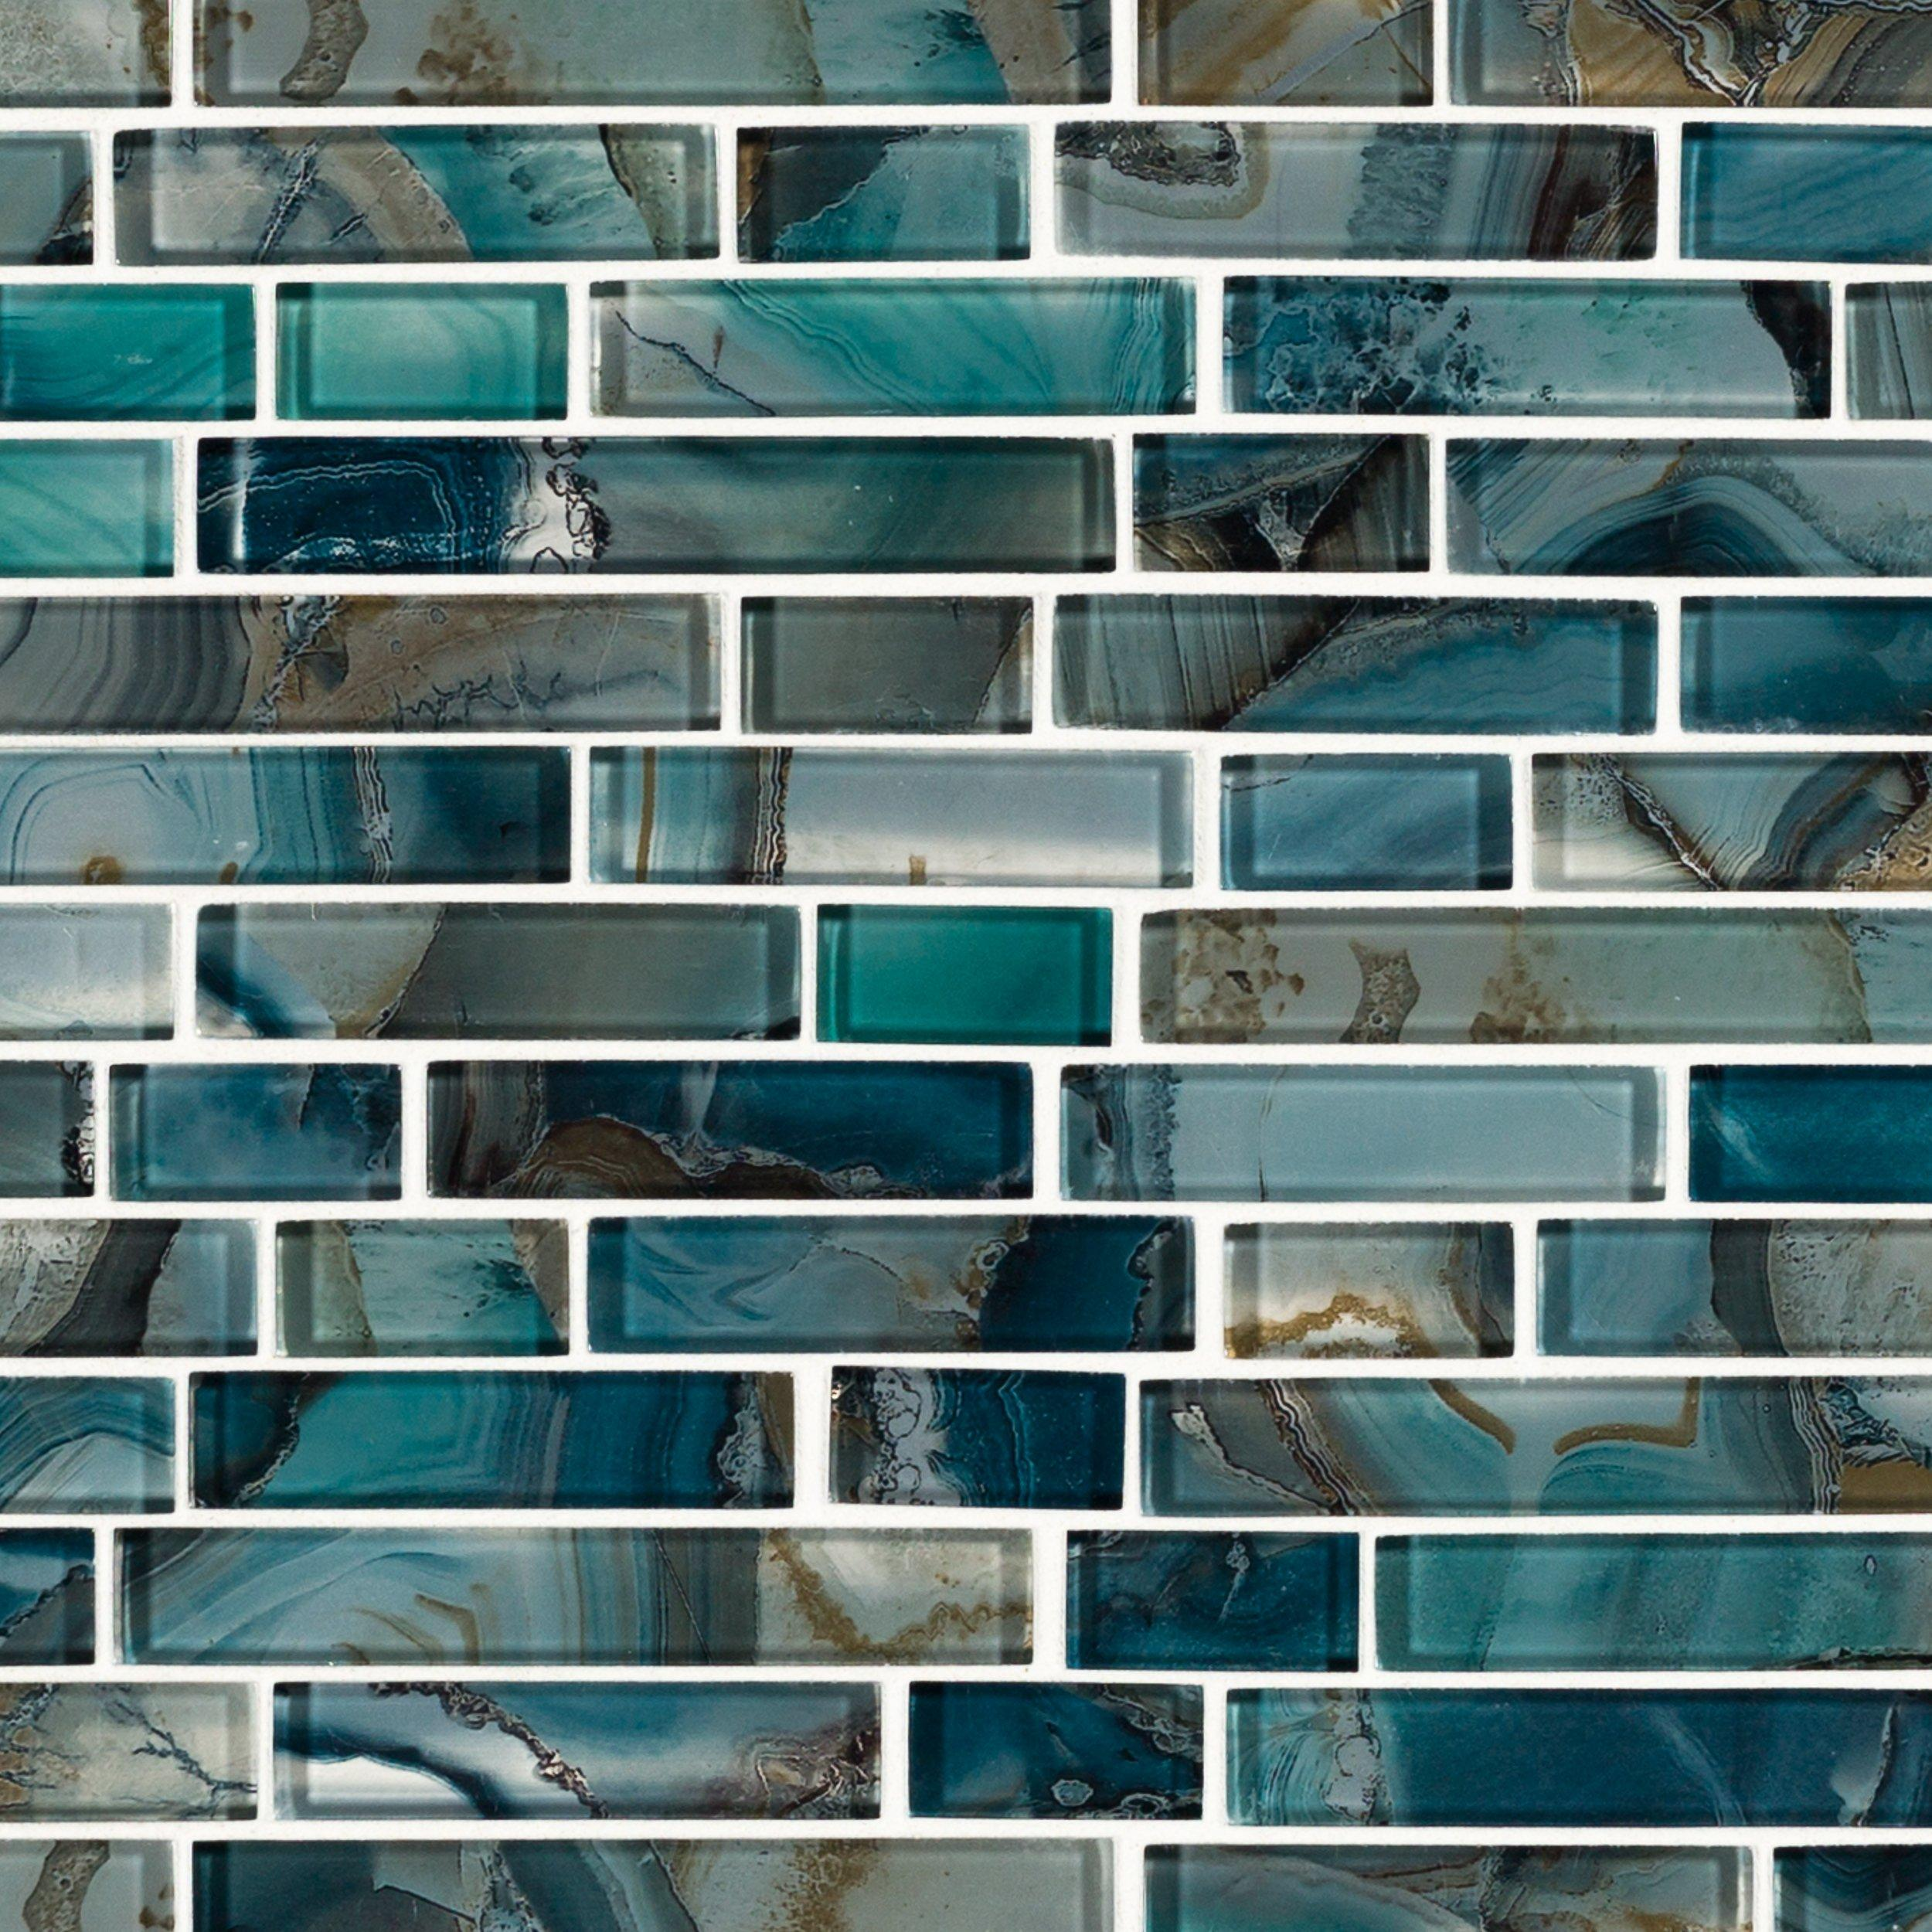 blue kitchen backsplash tile 5th wheel bunkhouse outdoor montage harbour island polished linear mosaic - 12in. x ...